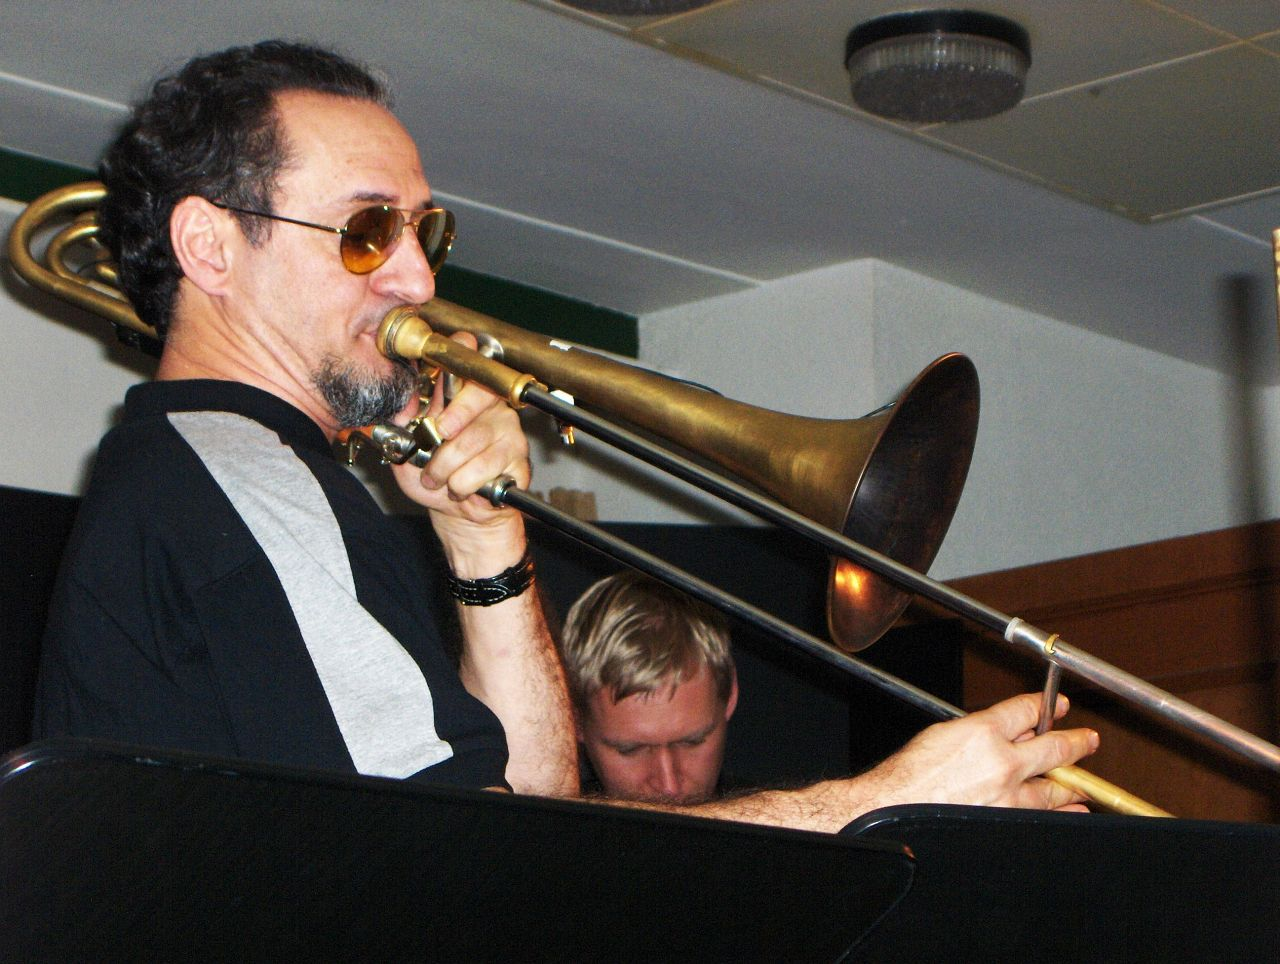 Musiker 362